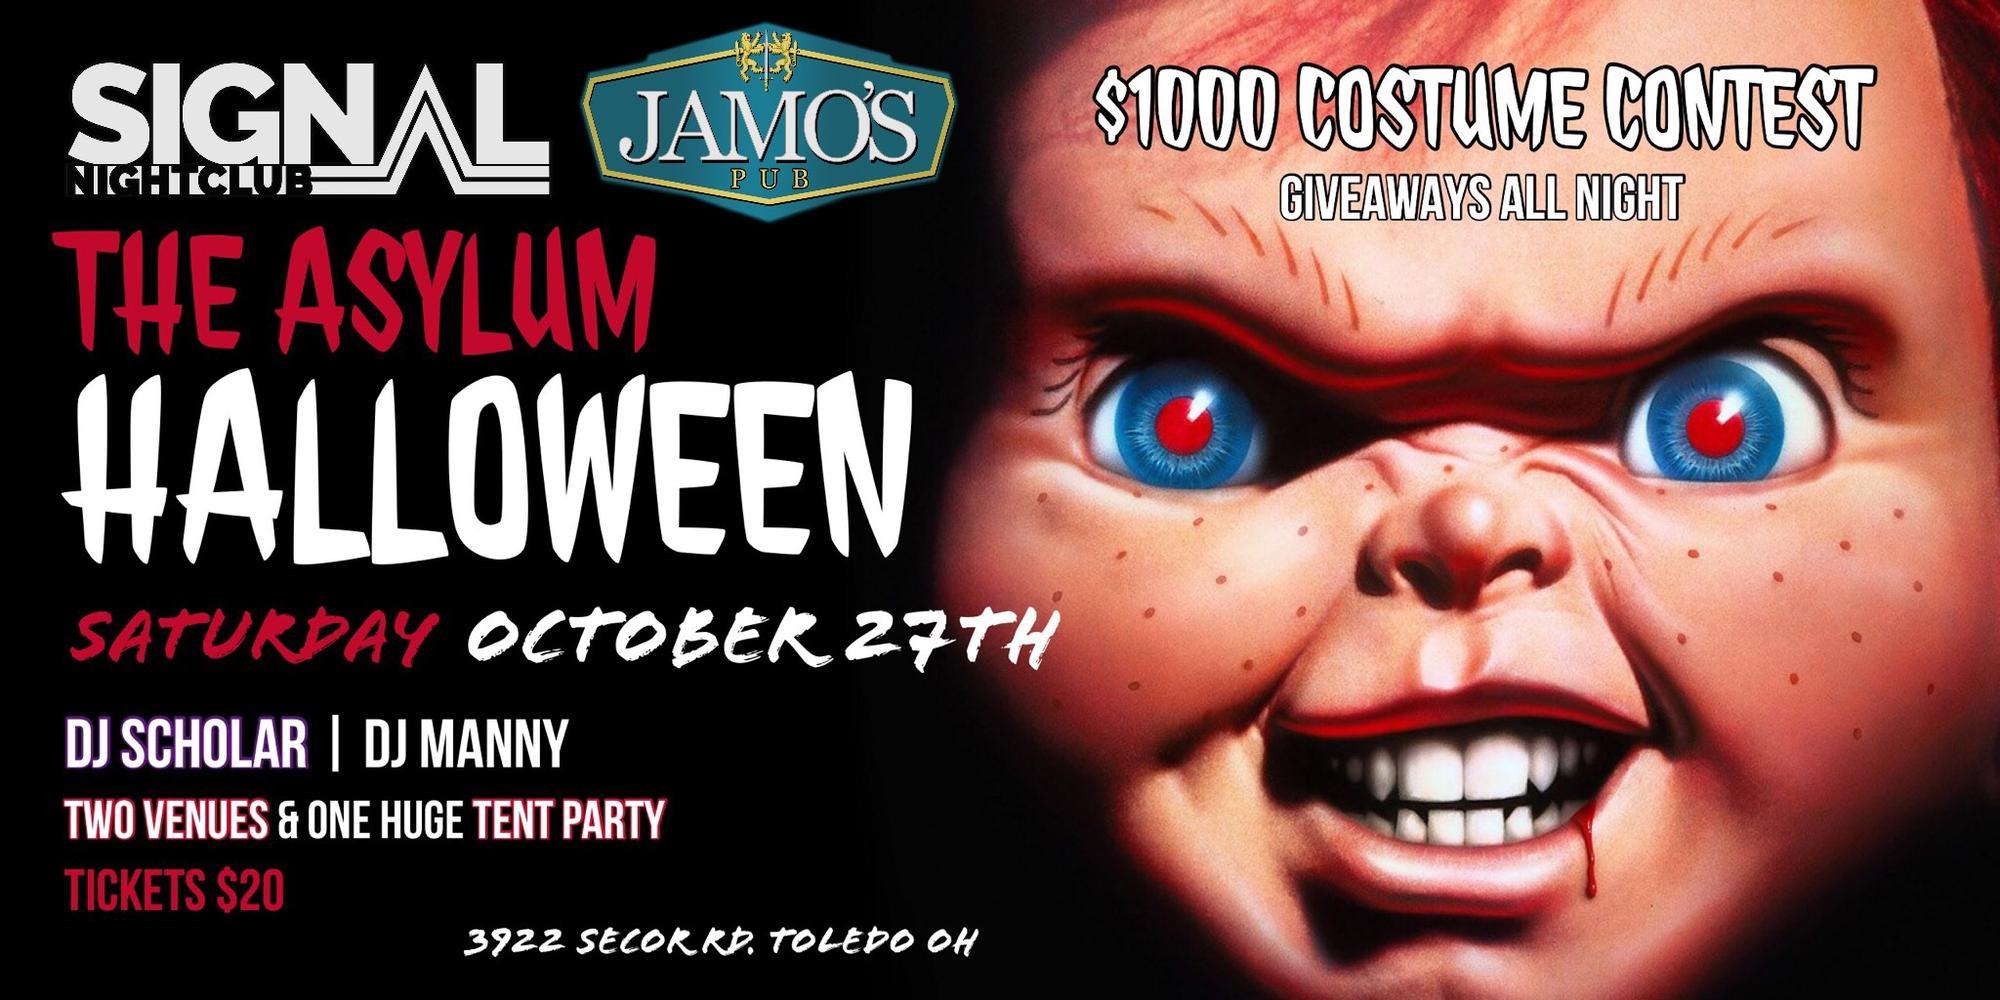 the asylum halloween bash (presentedsignal nightclub & jamo's